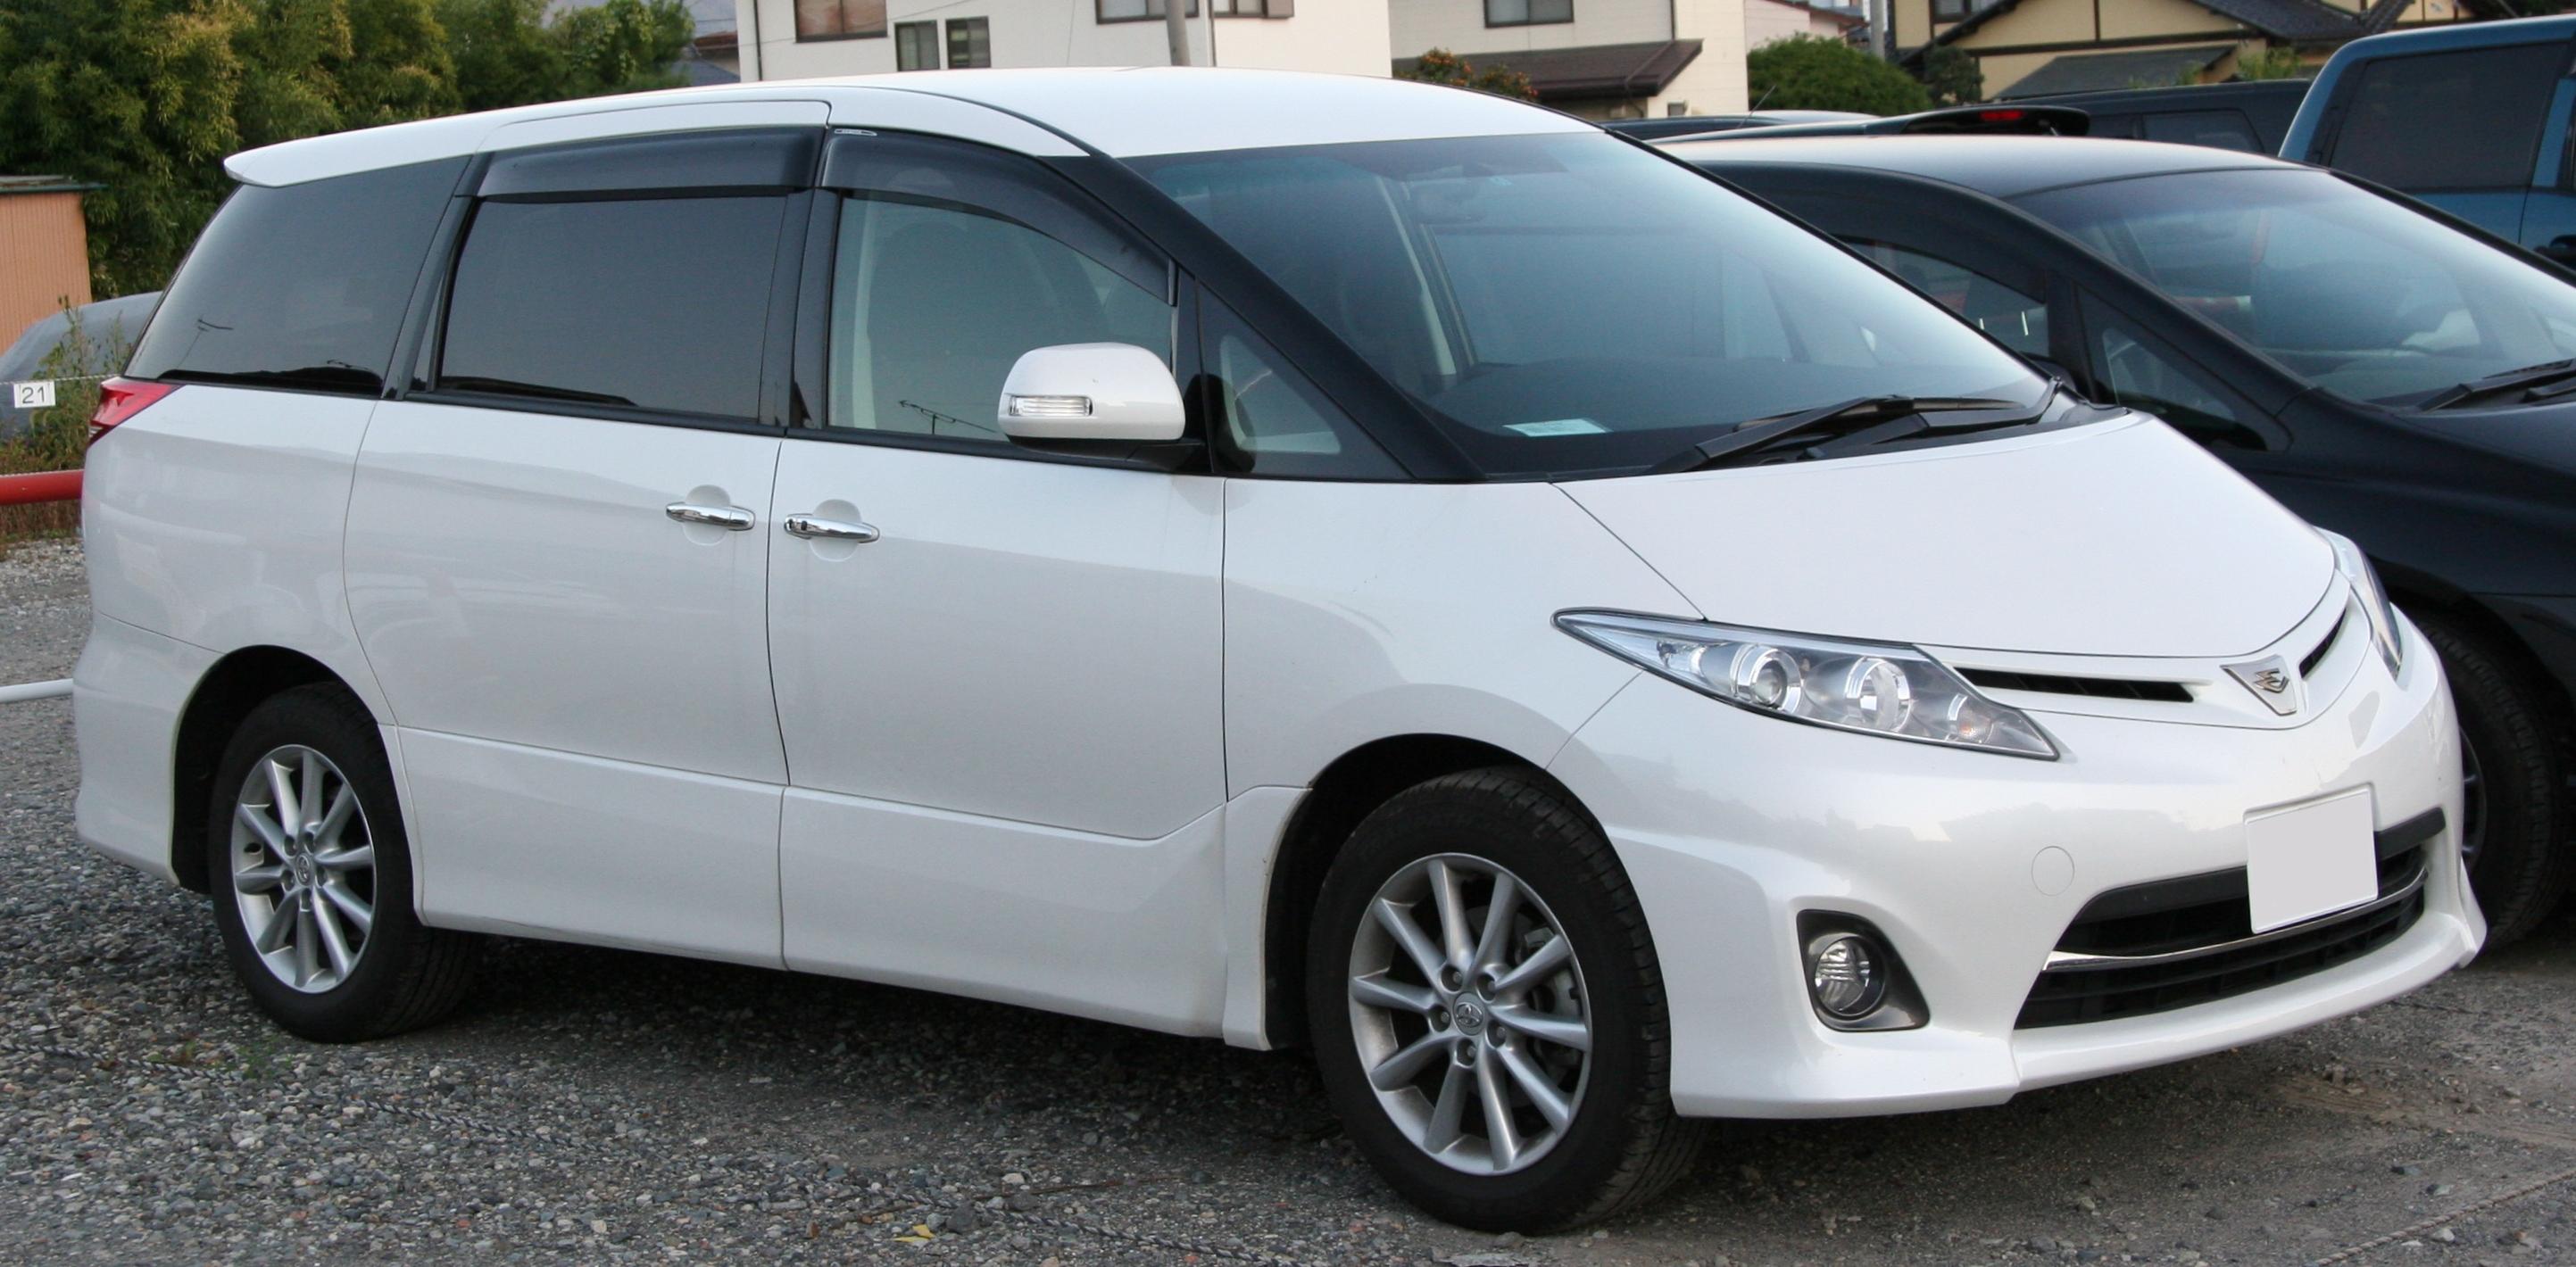 Toyota Estima New Car Price In Malaysia